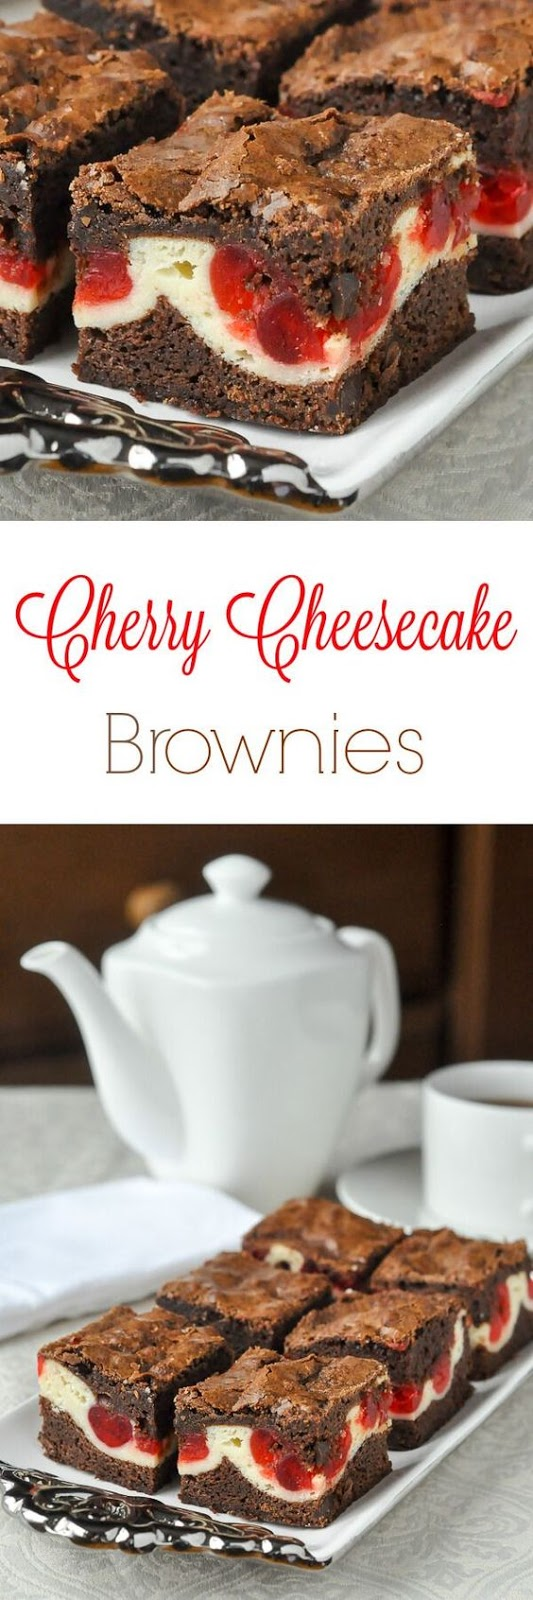 Coconut Flour Brownies (paleo, gluten-free, dairy-free)